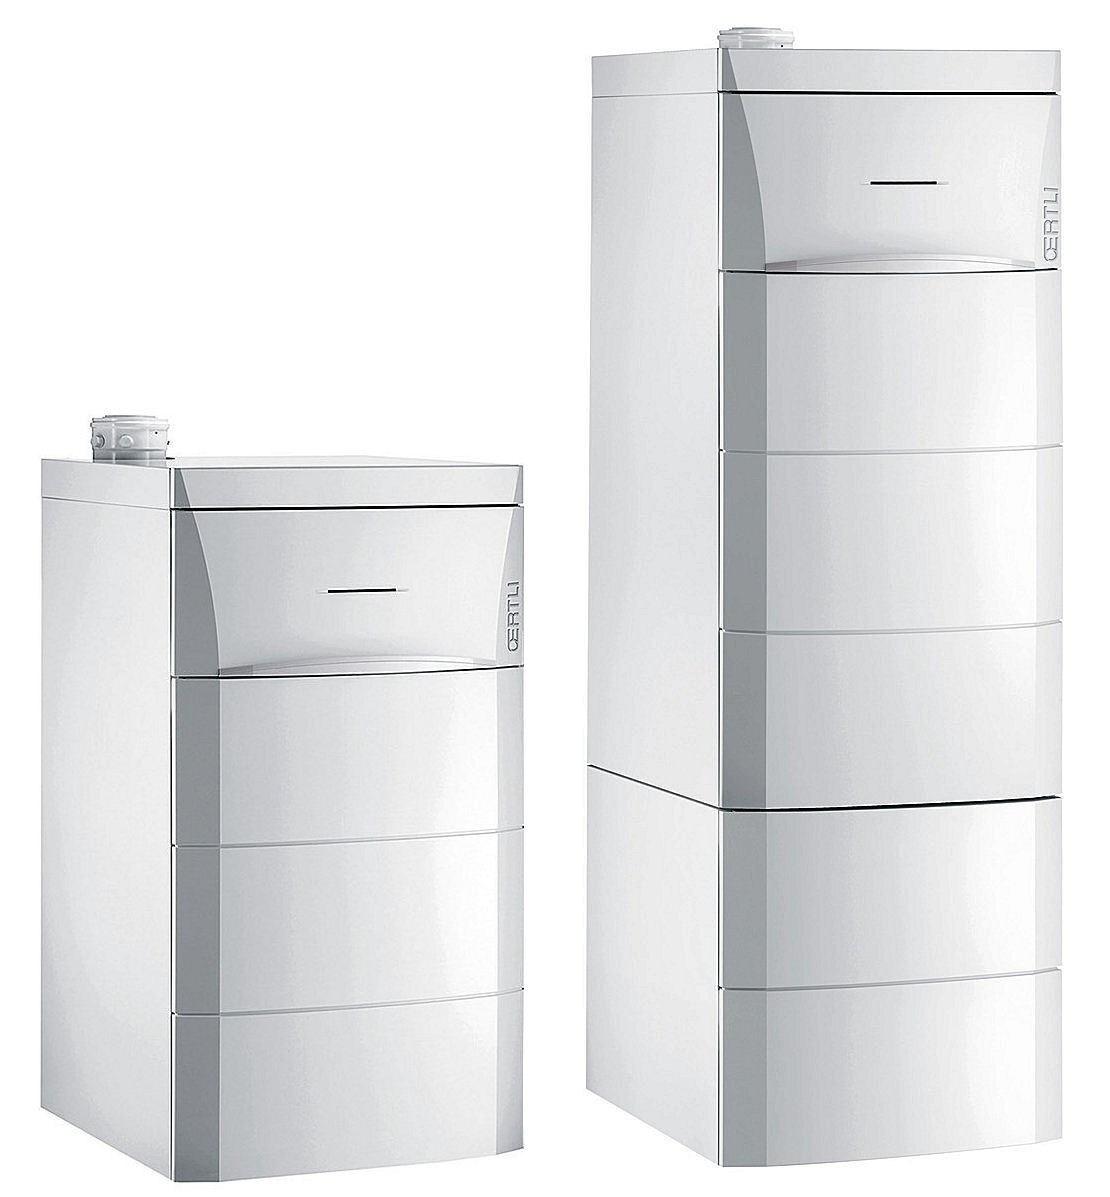 chaudire sol fioul modulante condensation oenoviafioul. Black Bedroom Furniture Sets. Home Design Ideas